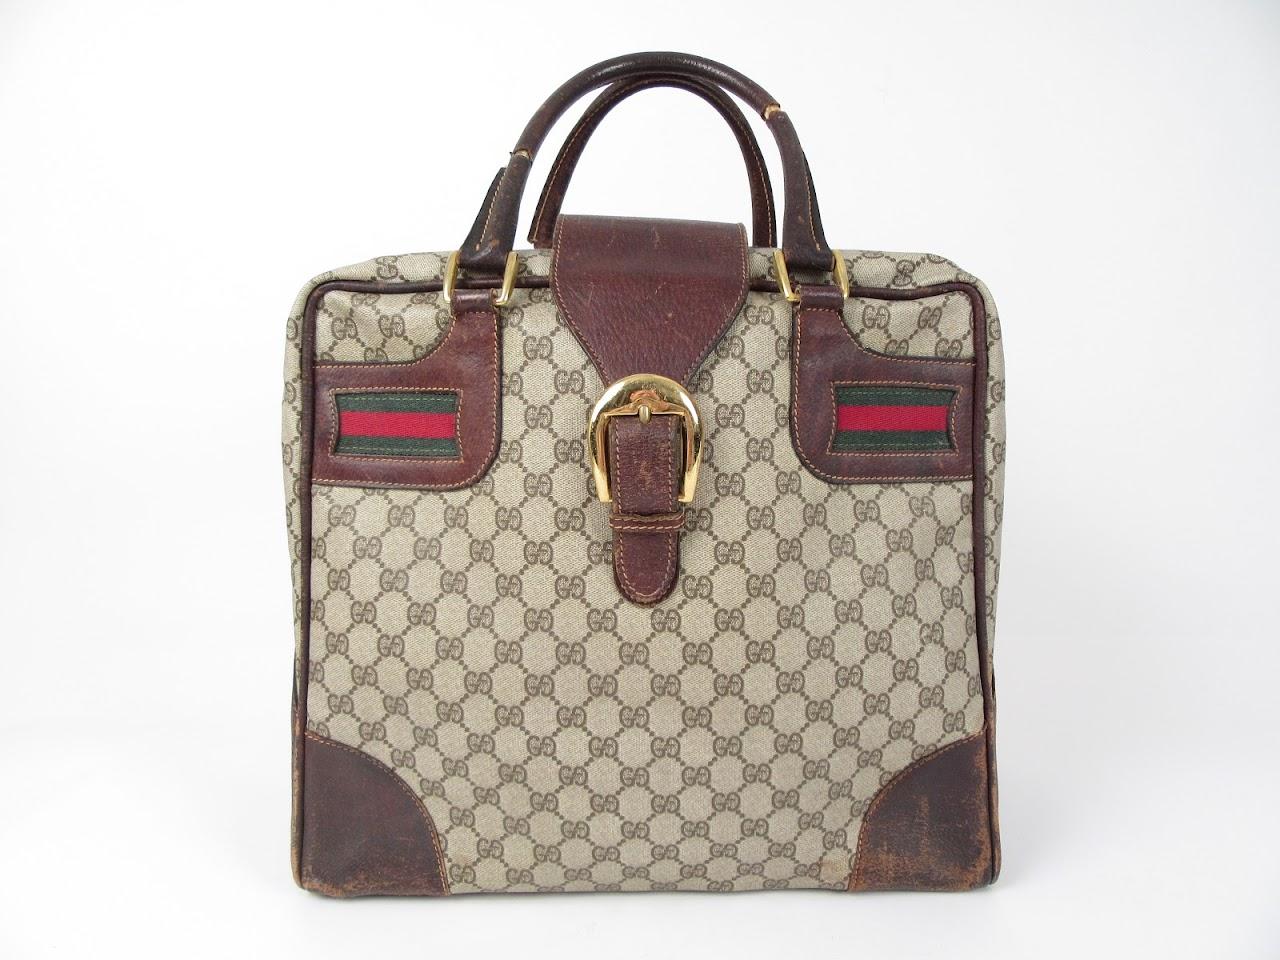 Gucci Vintage Monogram Travel Bag